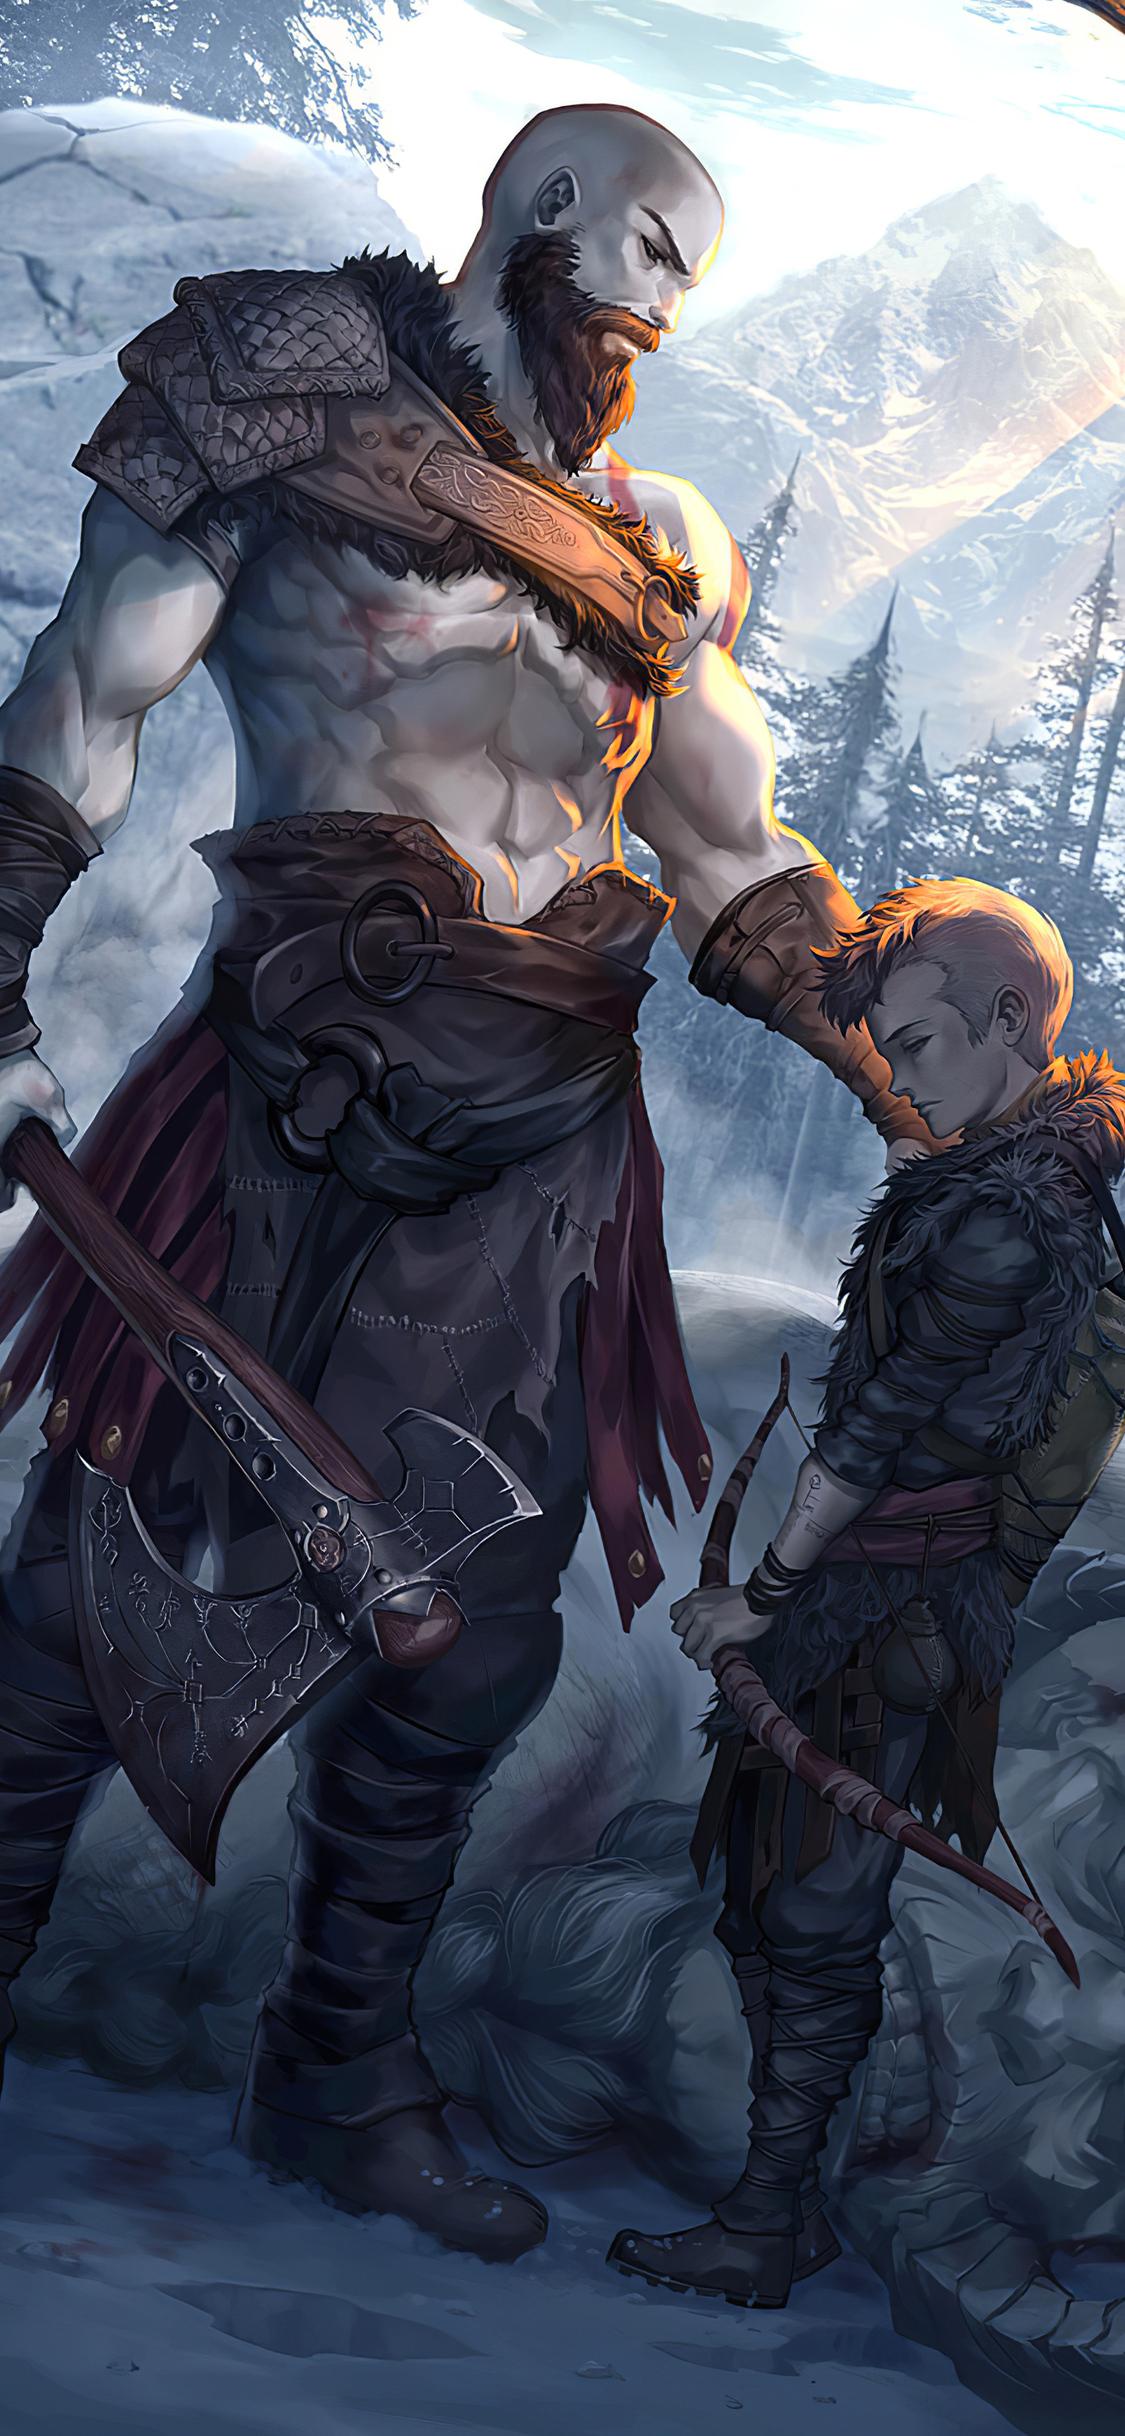 kratos-and-atreus-god-of-war-art-dz.jpg